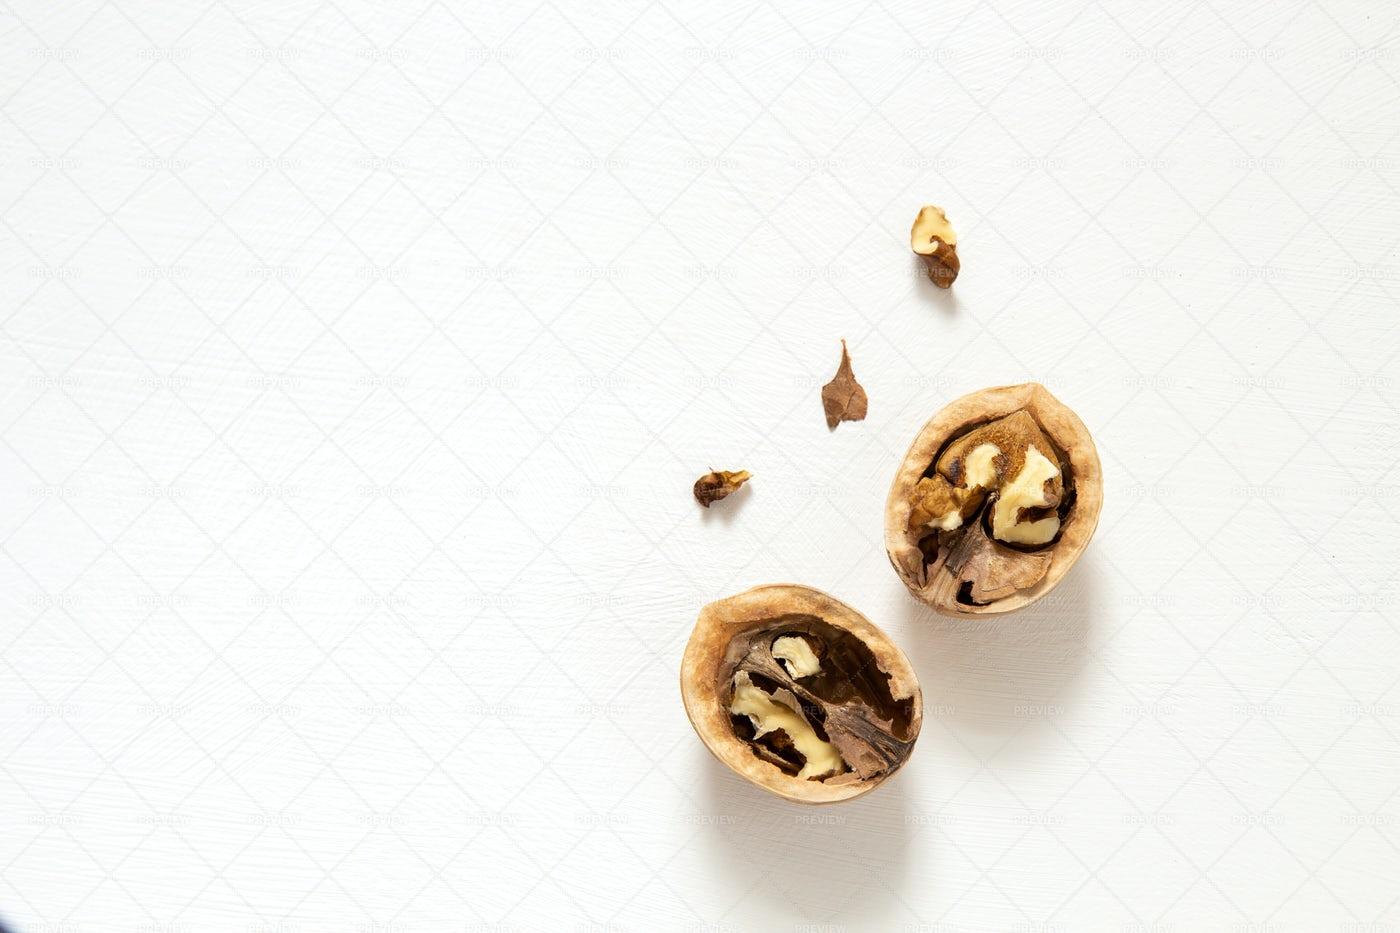 Chopped Walnut: Stock Photos